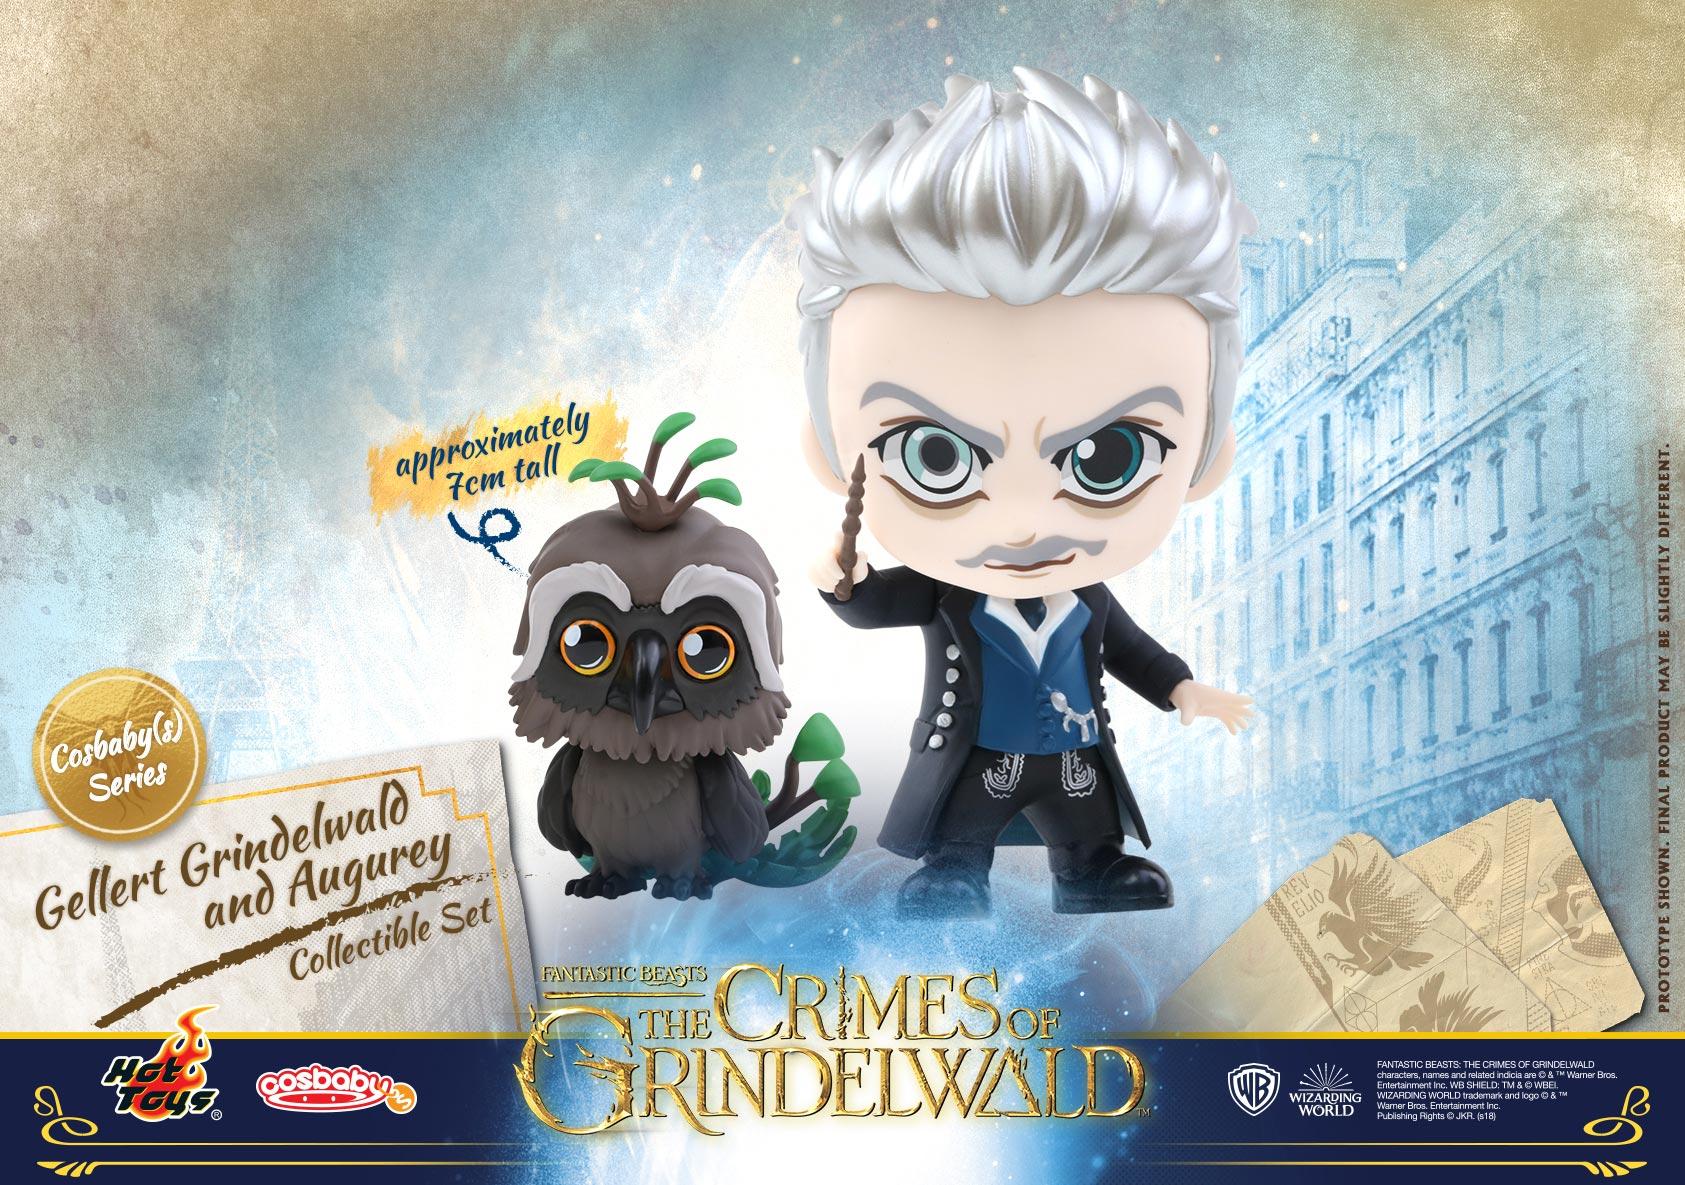 Hot-Toys---Fantastic-Beasts-2---Gellert-Grindelwald-and-Augurey-Cosbaby-(S)-Collectible-Set_PR1